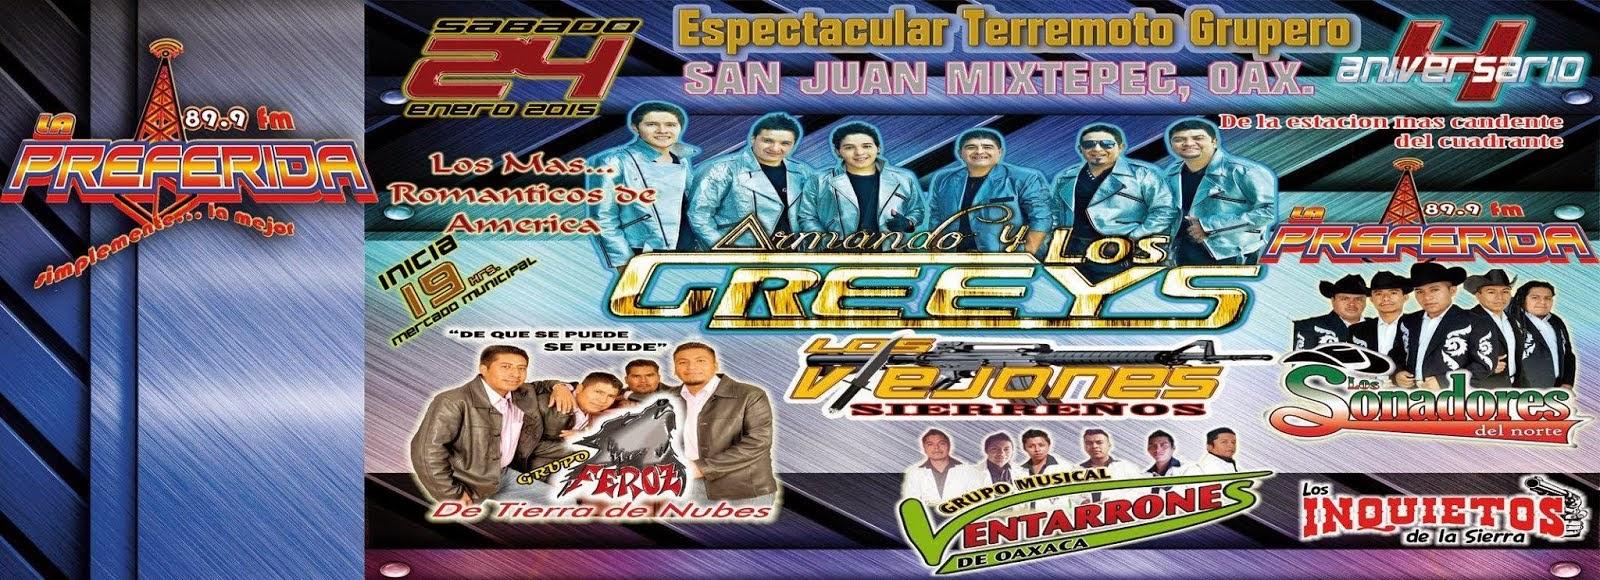 La Radio De San Juan Mixtepec 89.9